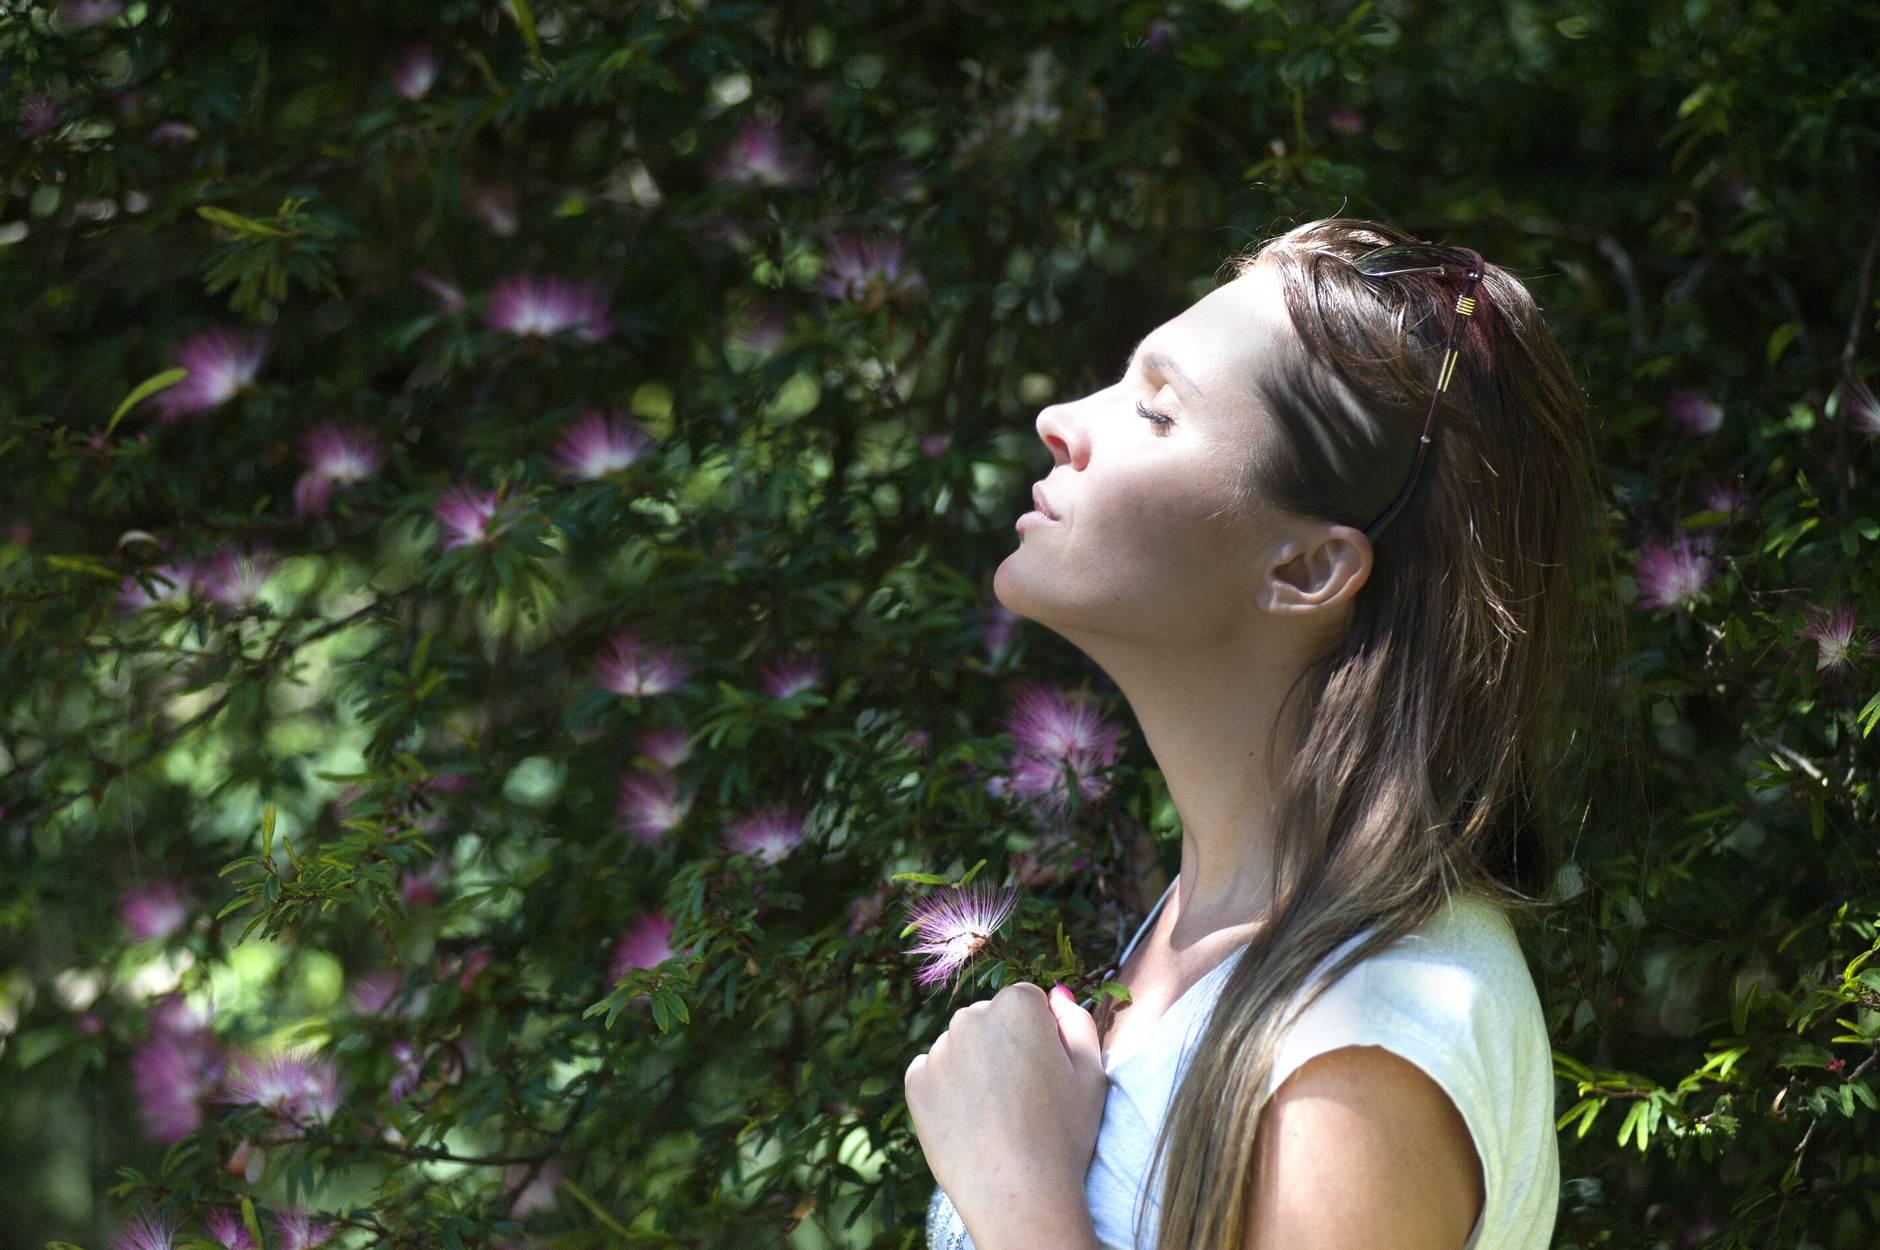 Who You Are : A Meditation #MondayBlogs #MondayMusings